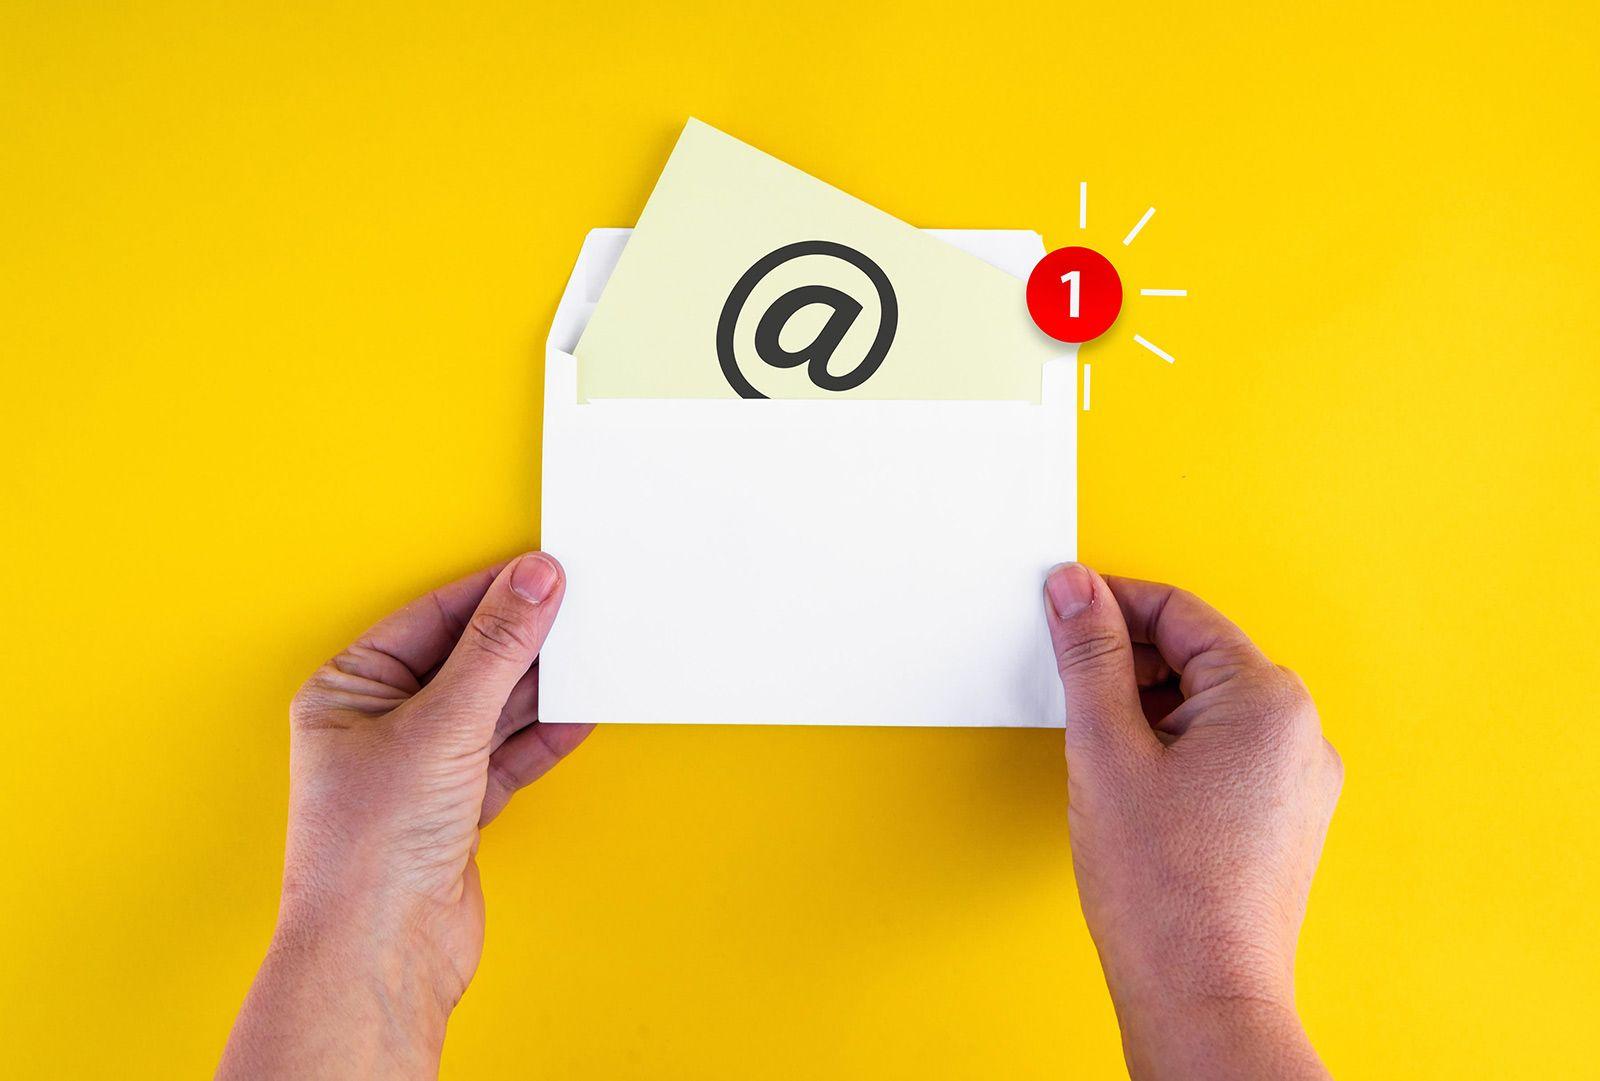 envelope.jpg.a7628ae4cb63d89206b1c9686fcd0276.jpg